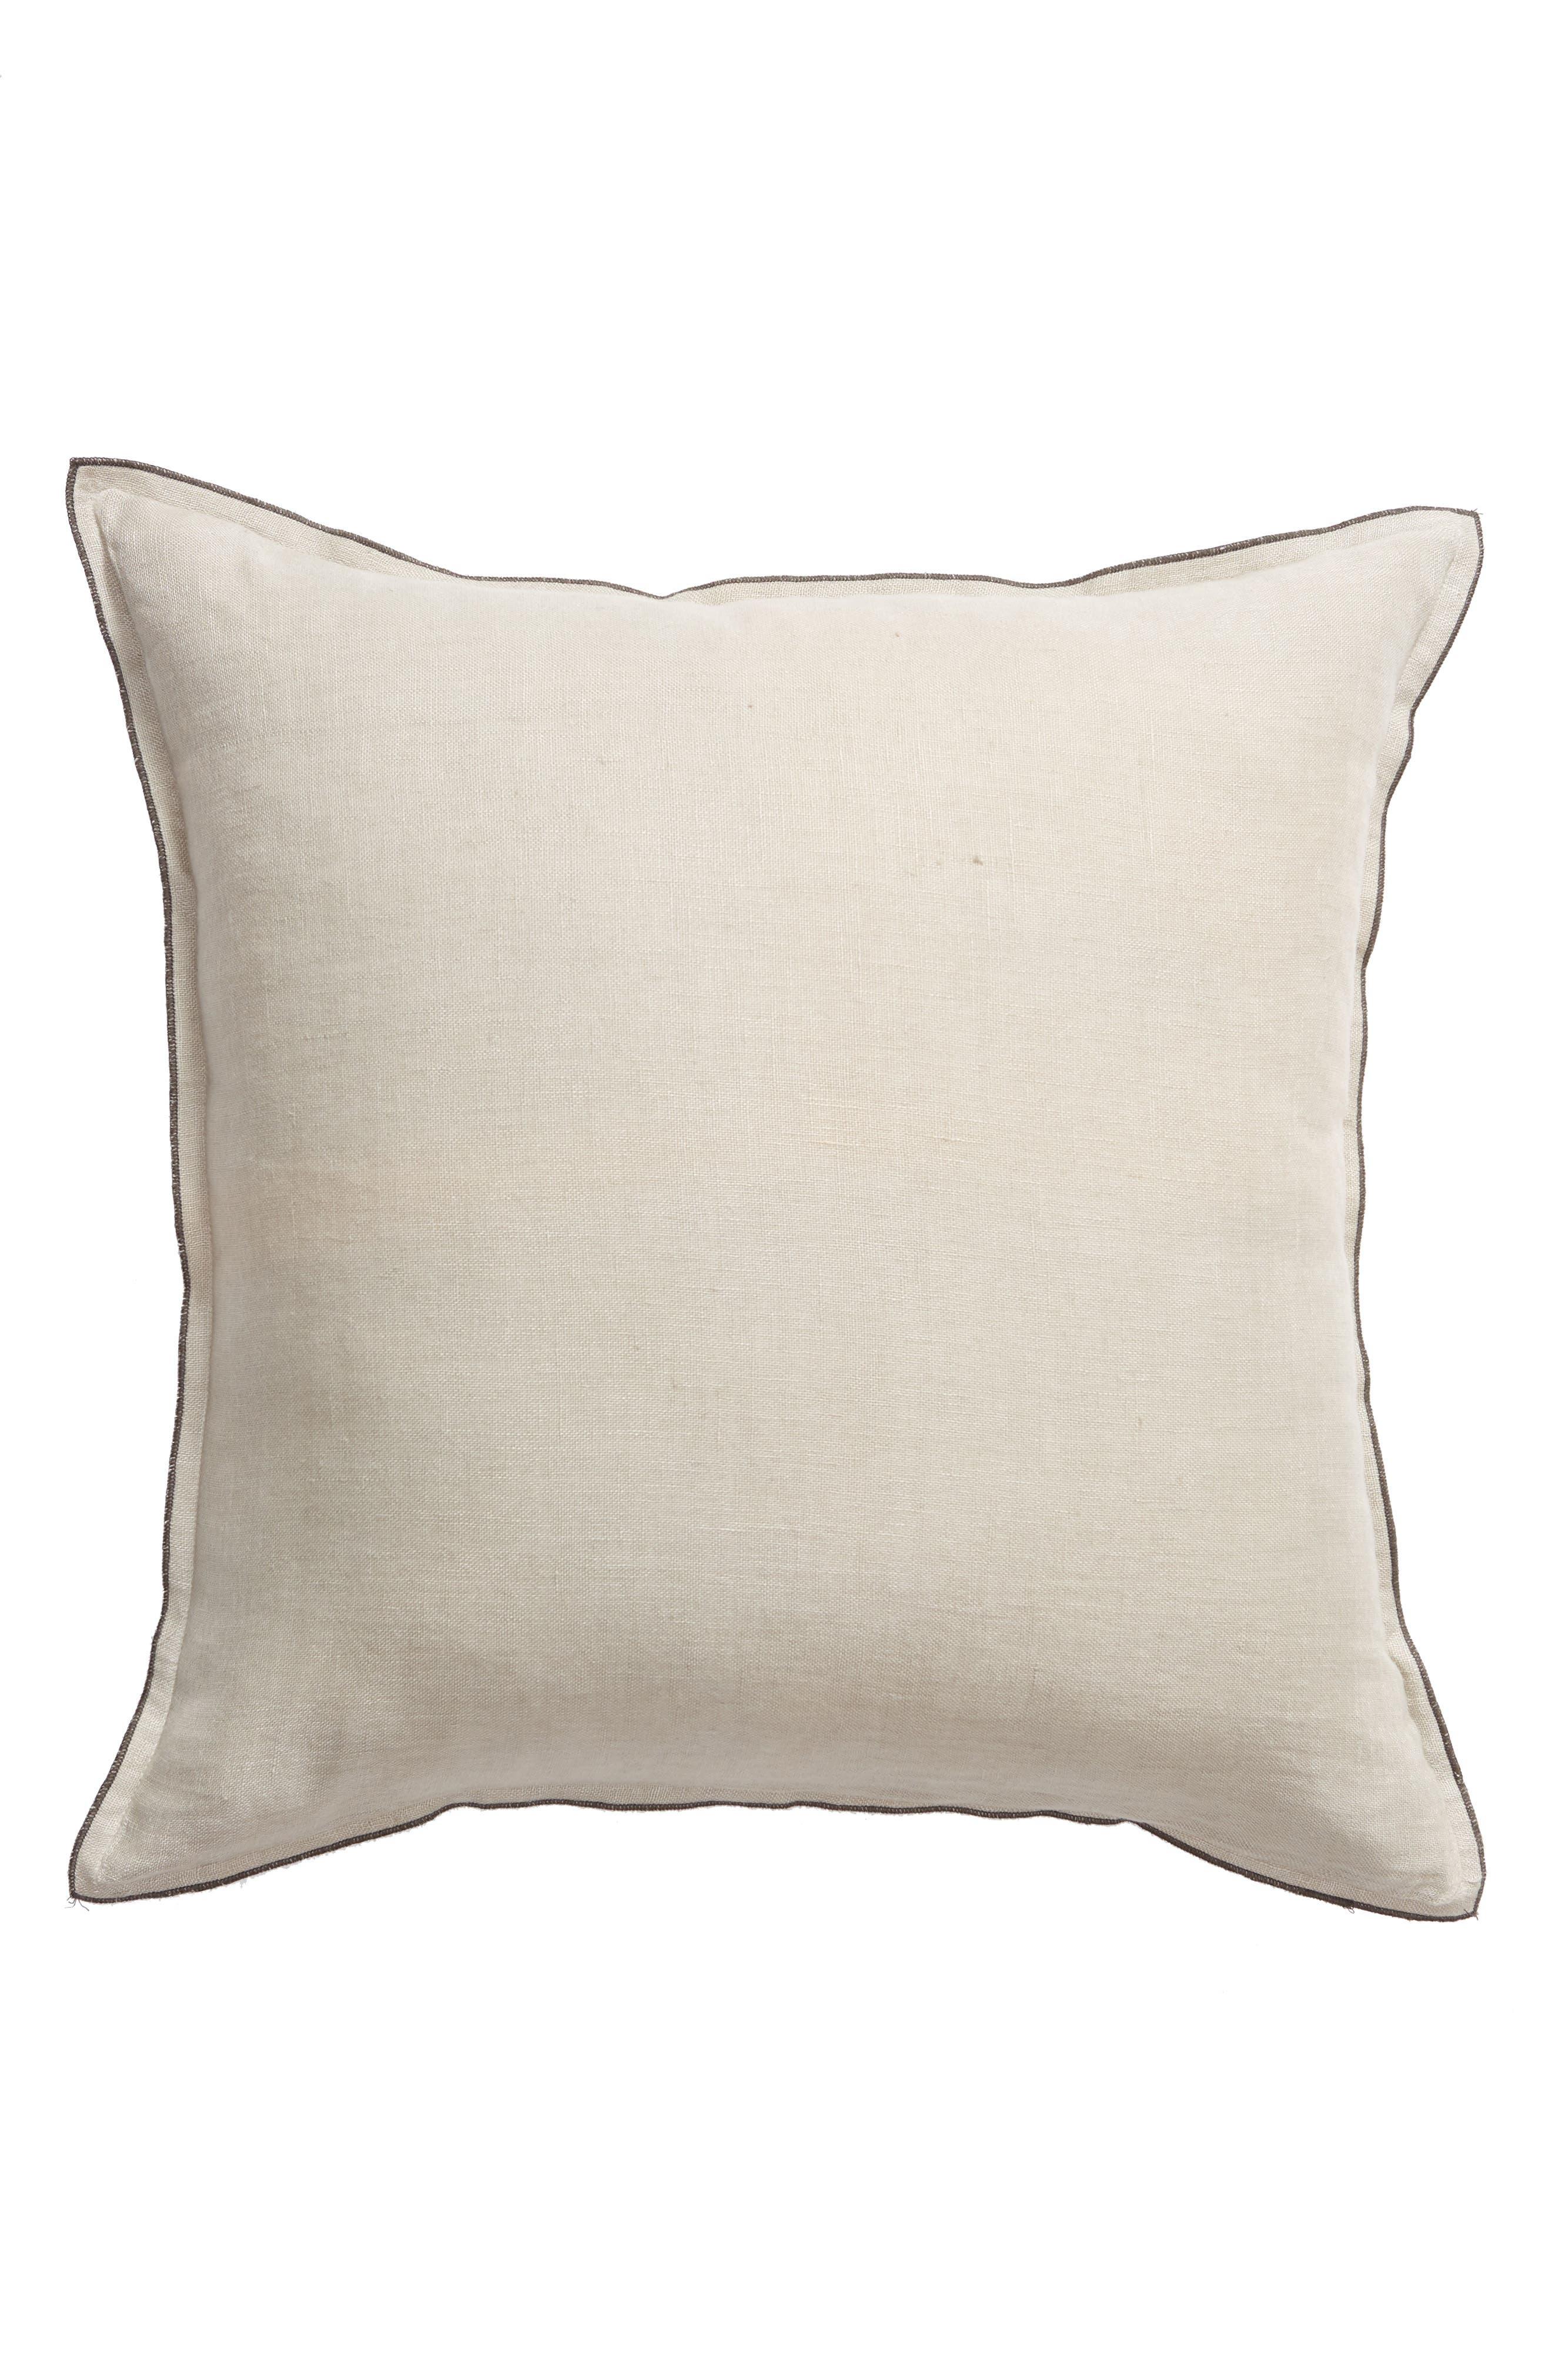 TREASURE & BOND, Linen Accent Pillow, Main thumbnail 1, color, GREY OWL